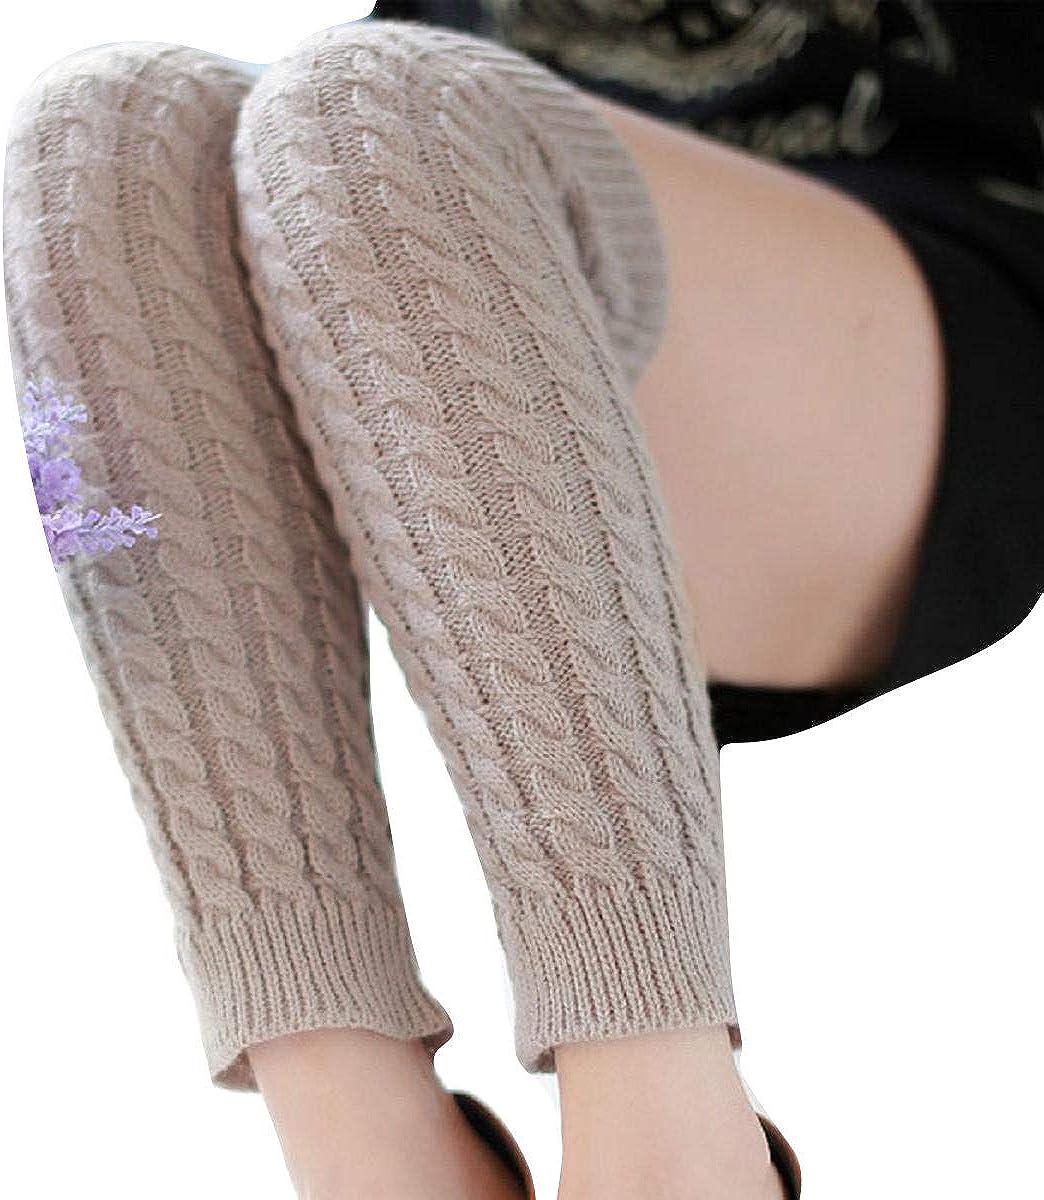 UJUNAOR 2018 Frauen Wollesocken Yoga Socken Warme Winter Leggings Beindecke Elastizit/ät